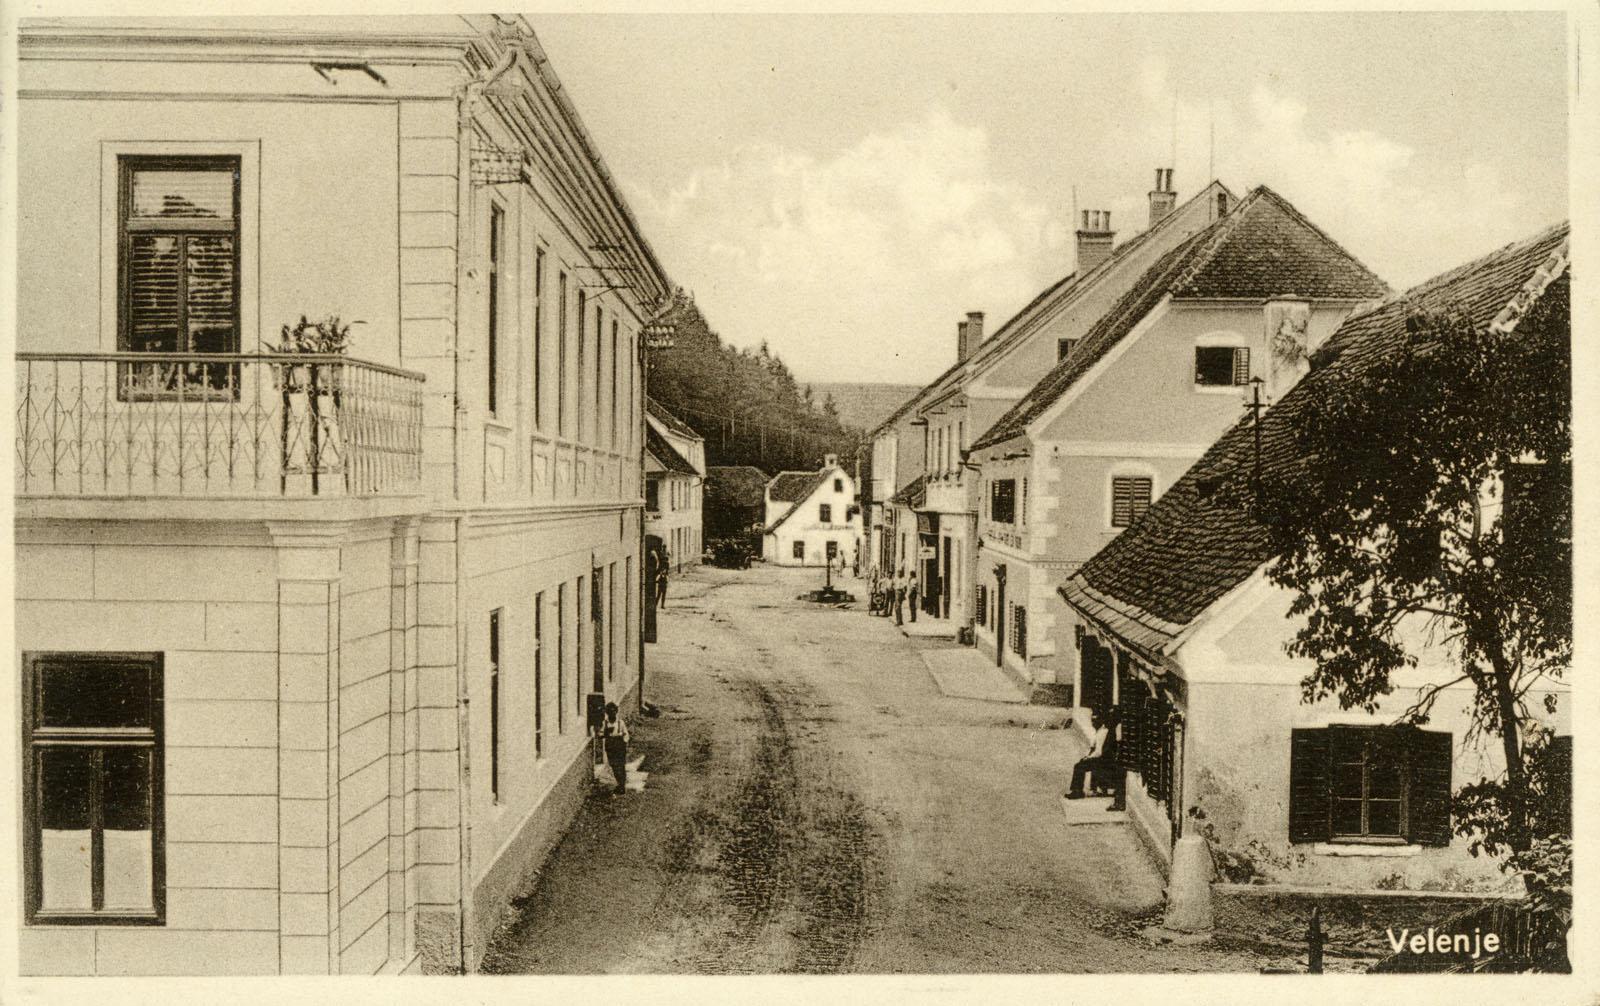 Mlinškov zapis o zgodovini trga